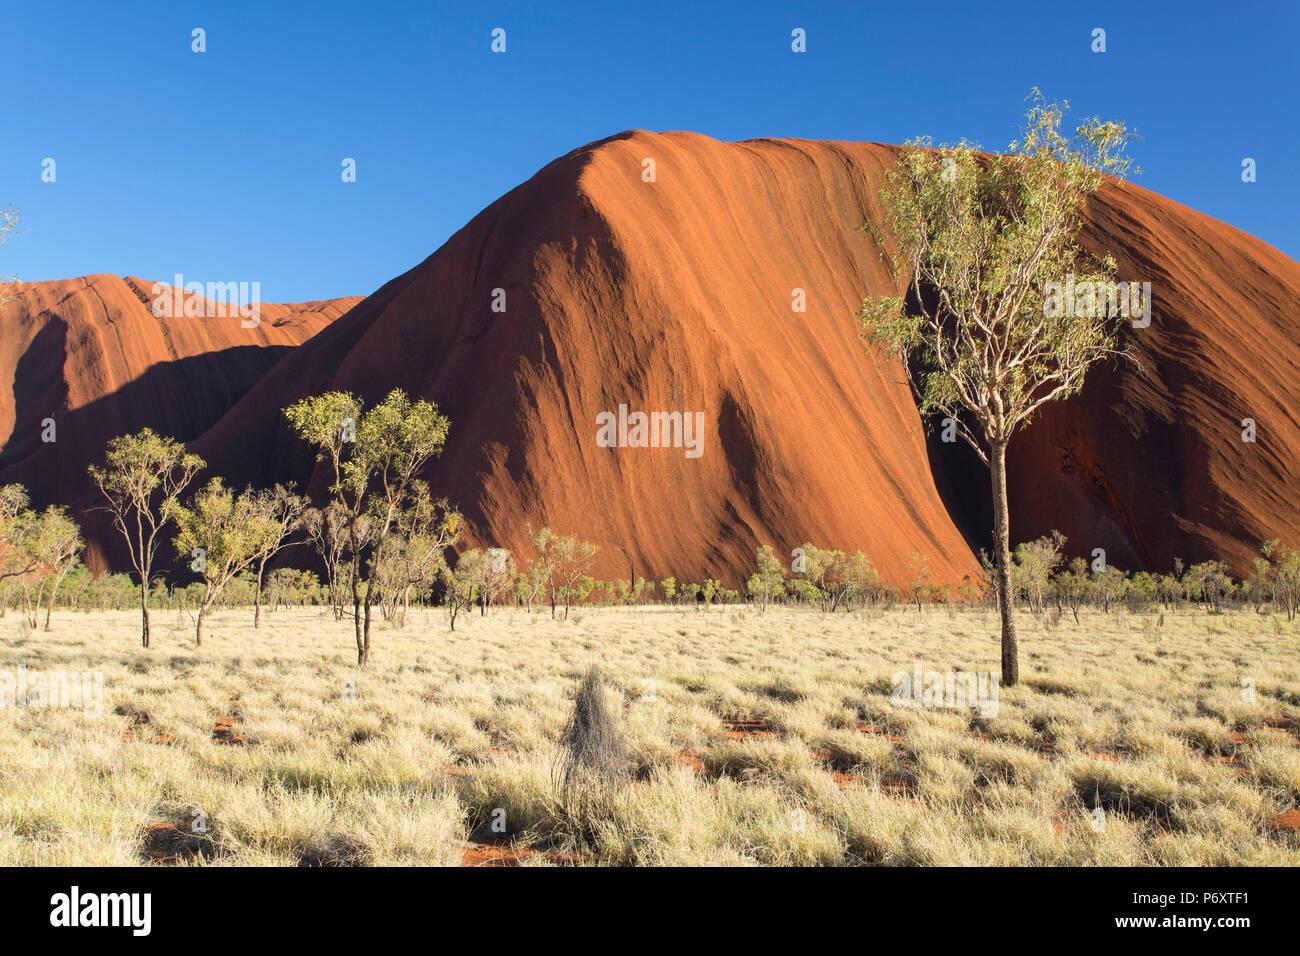 Uluru (UNESCO World Heritage Site), Uluru-Kata Tjuta National Park, Northern Territory, Australia - Stock Image